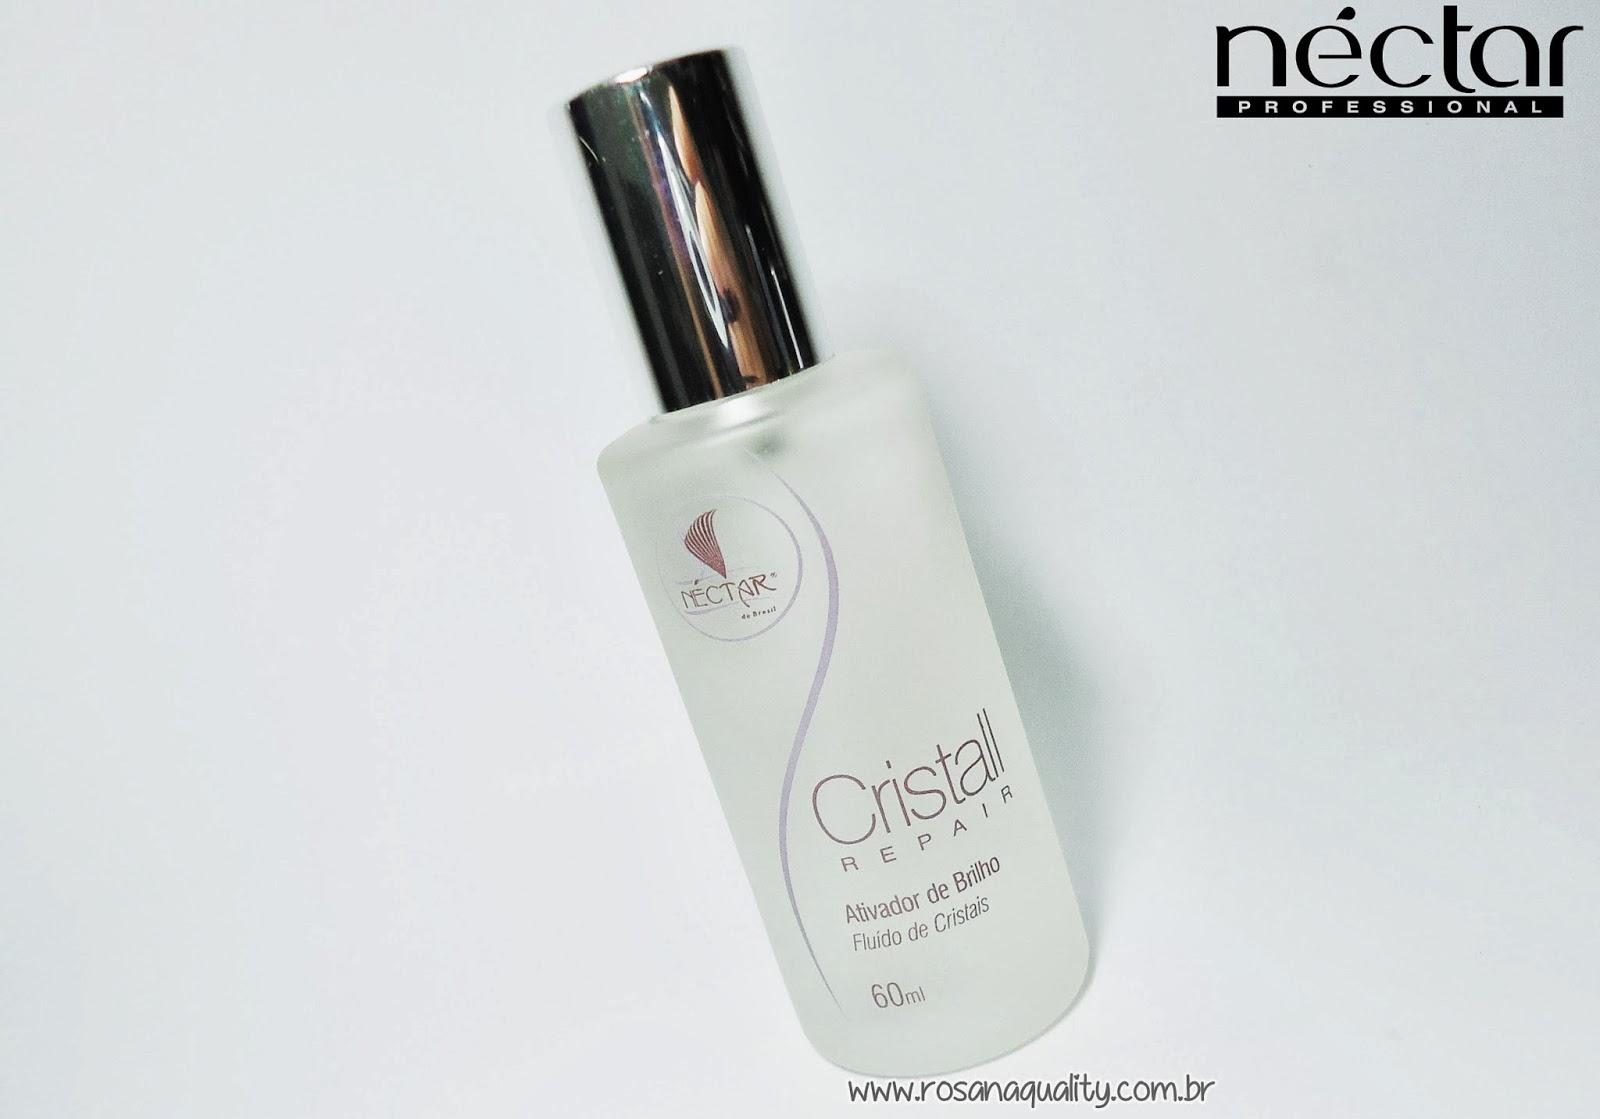 Cristall Repair Néctar